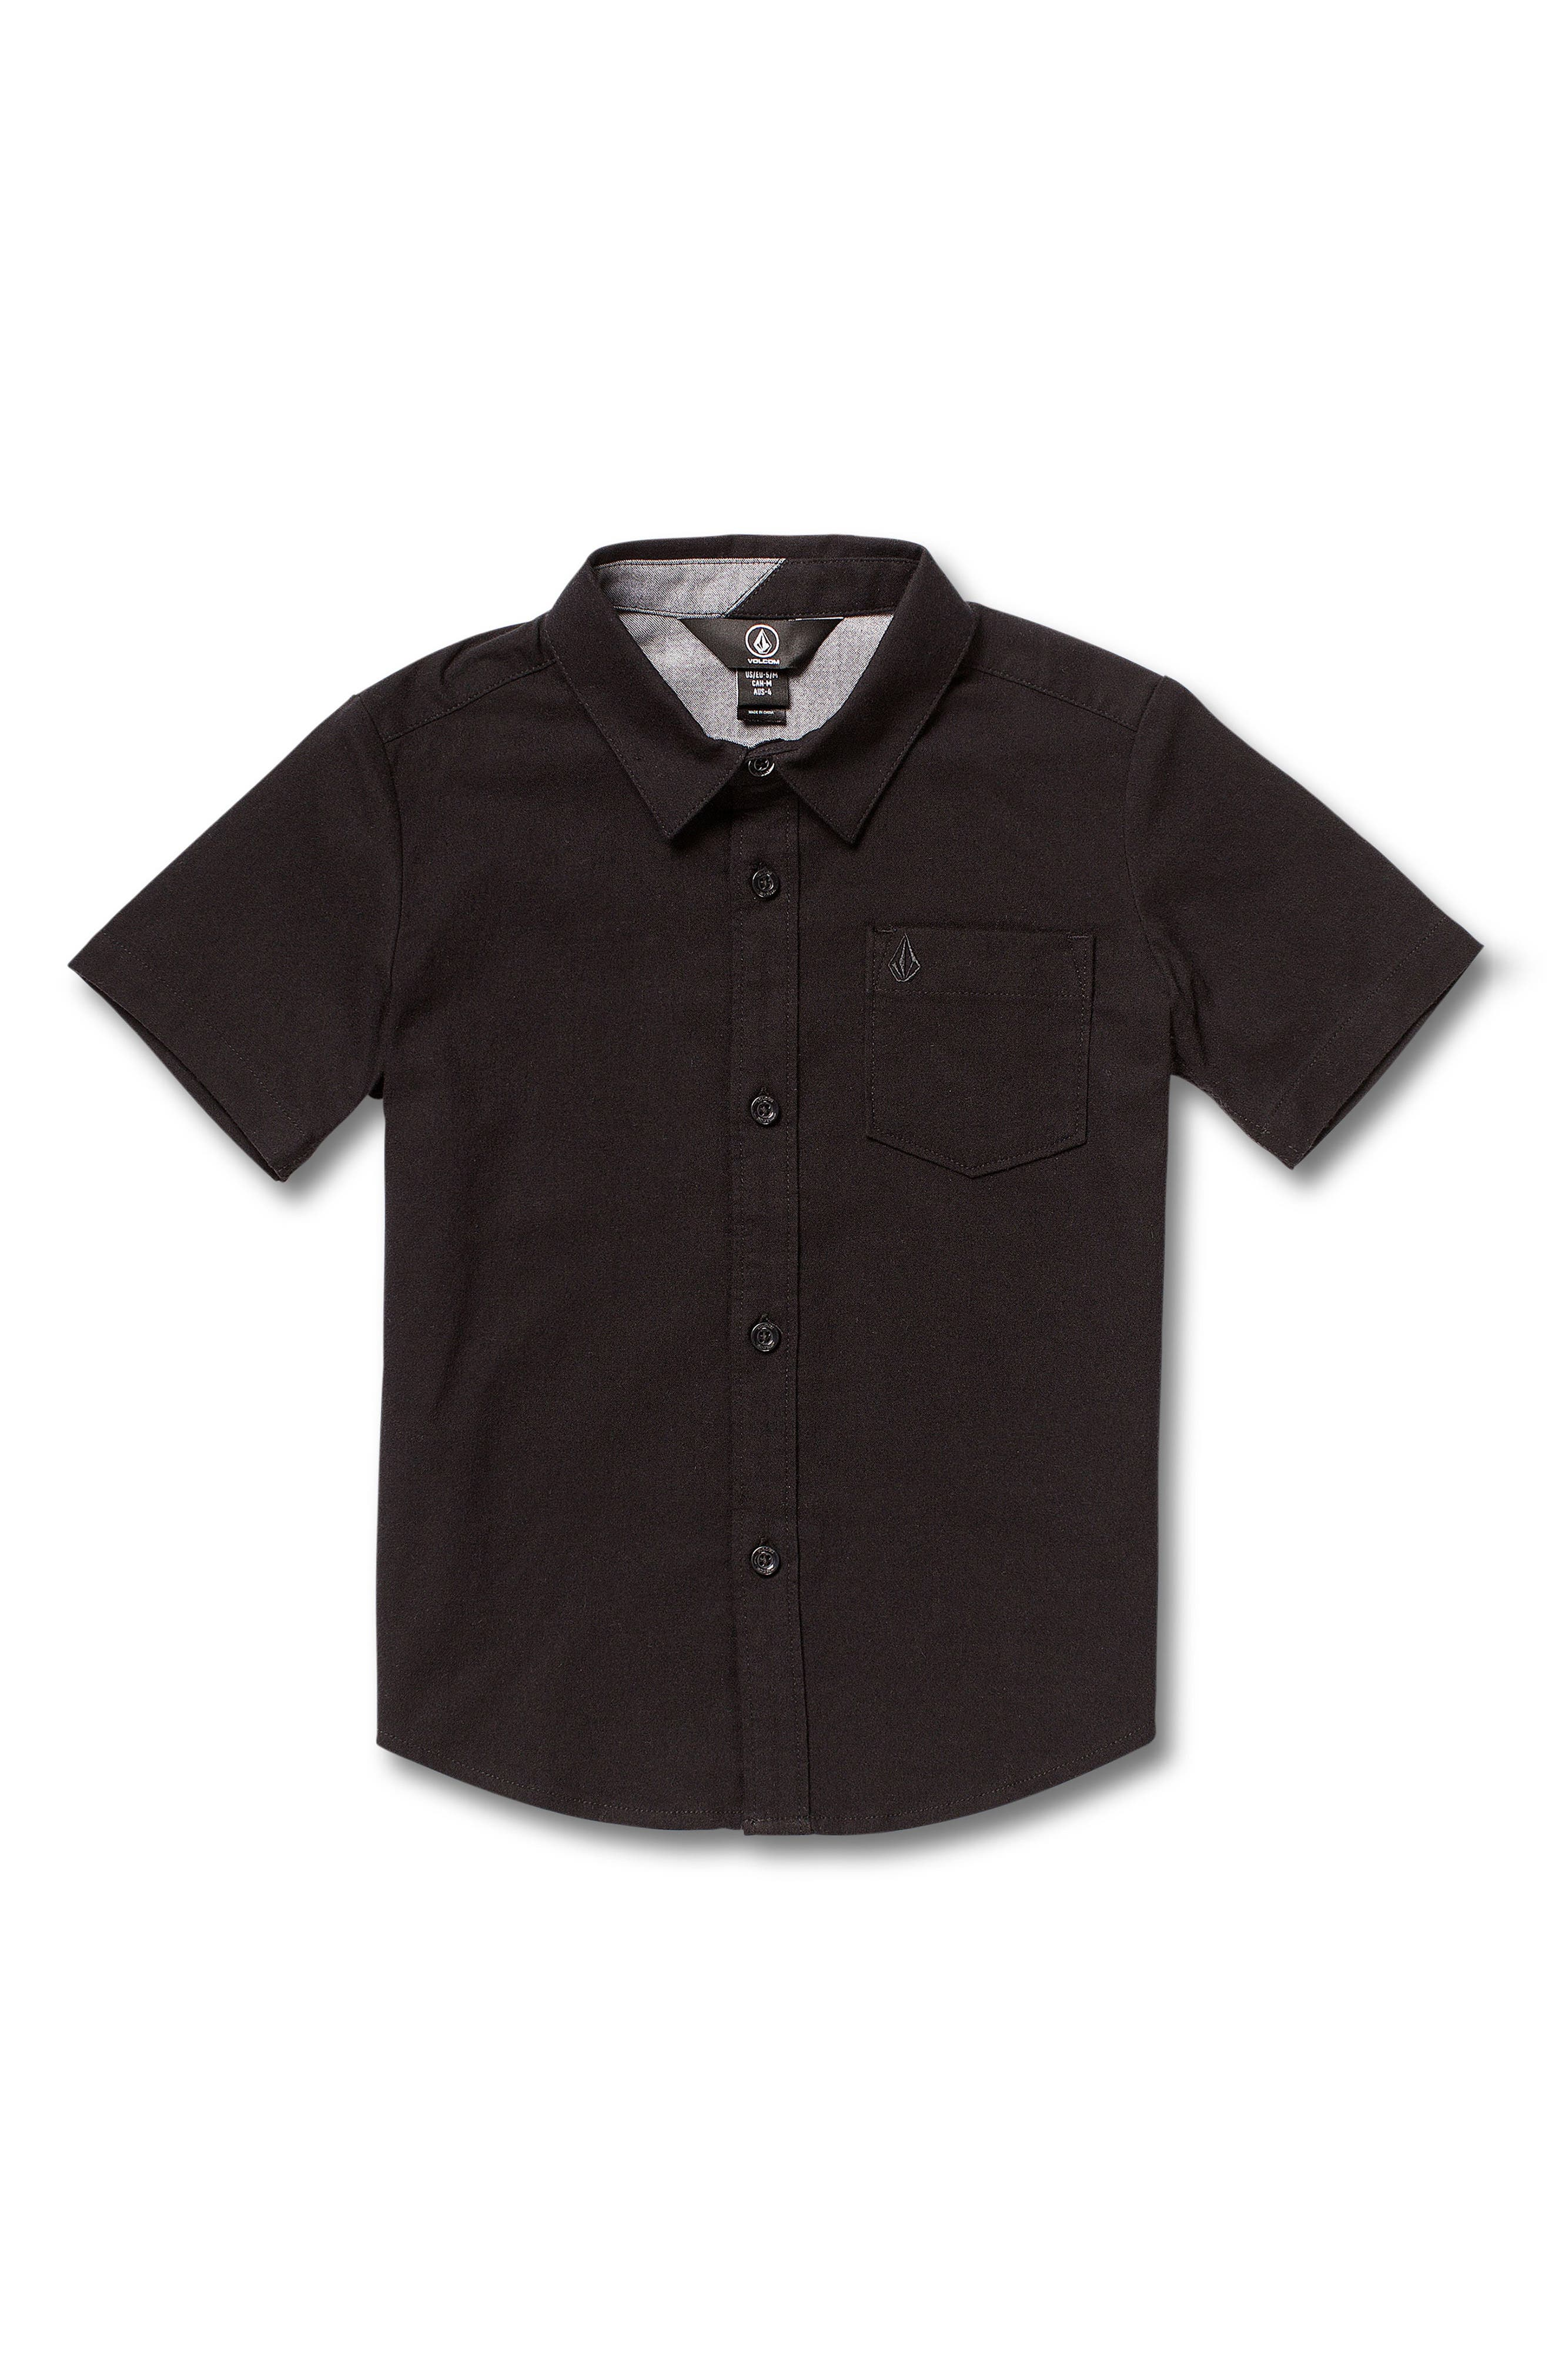 Everett Oxford Woven Shirt,                             Main thumbnail 1, color,                             004